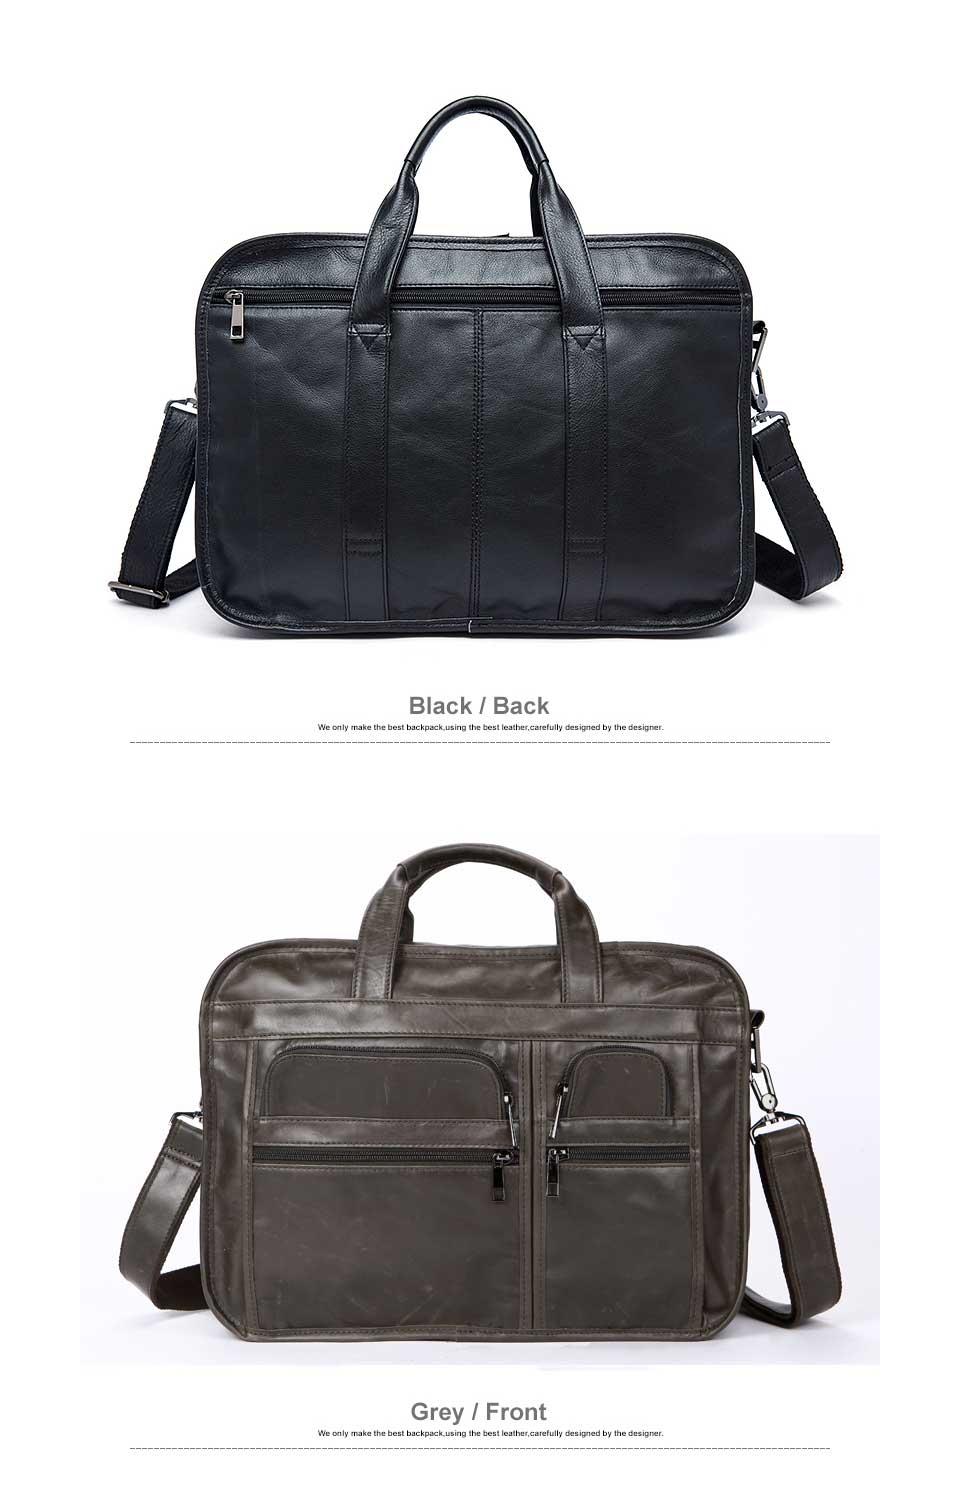 HTB1HjOhg8fH8KJjy1Xbq6zLdXXaE WESTAL men's genuine leather bag for men's briefcase office bags for men leather laptop bag document business briefcase handbag